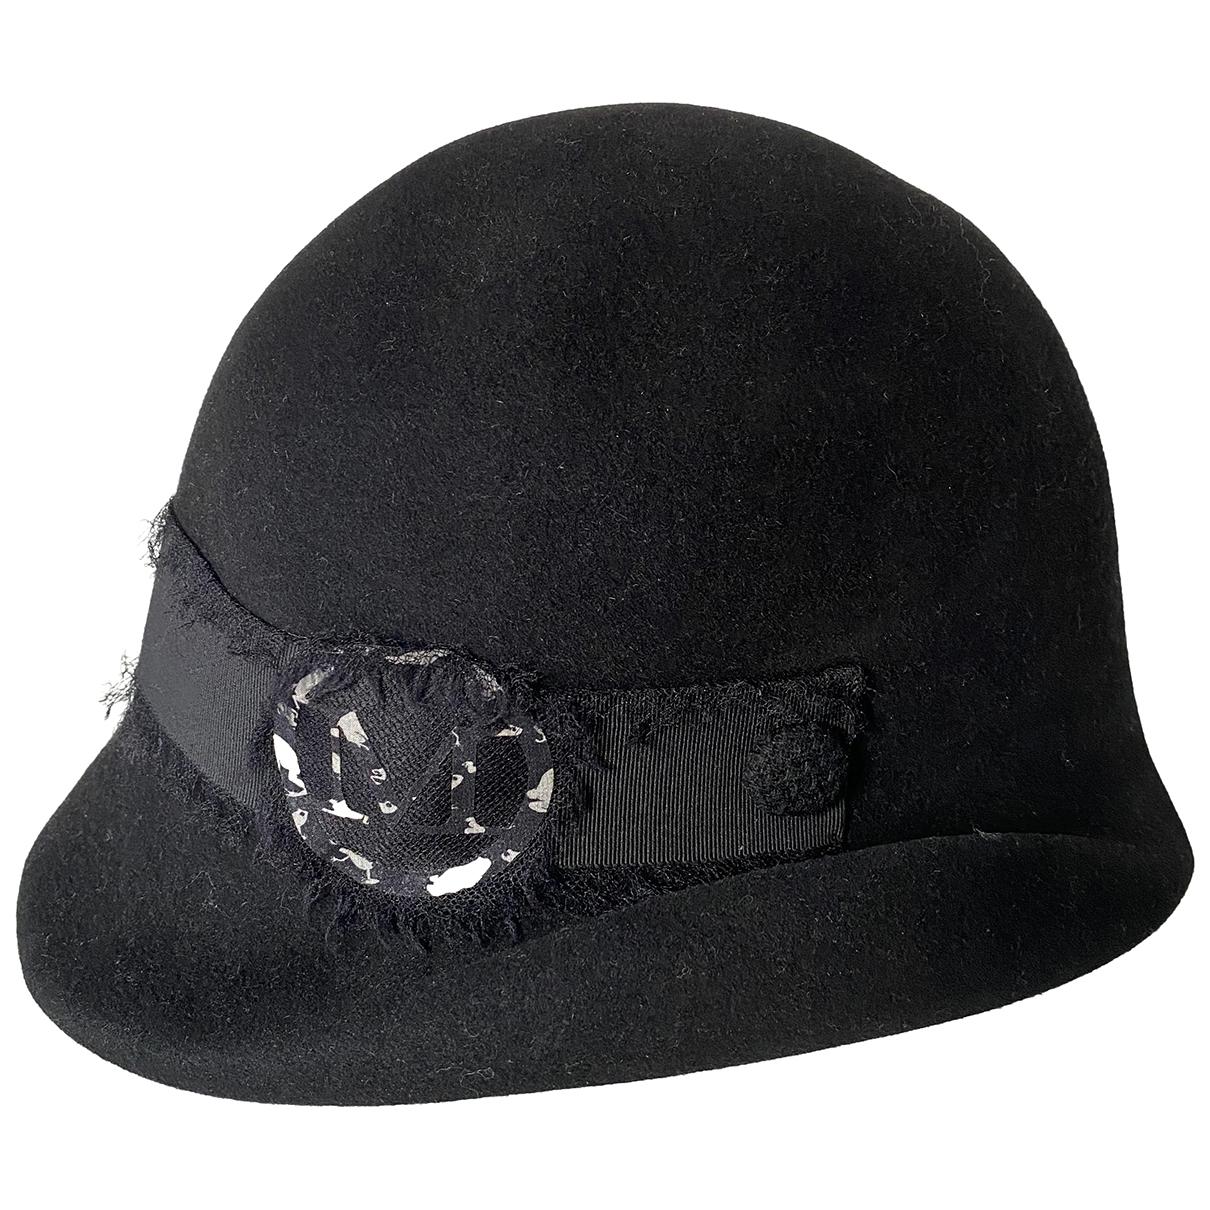 Sombrero de Lana Maison Michel